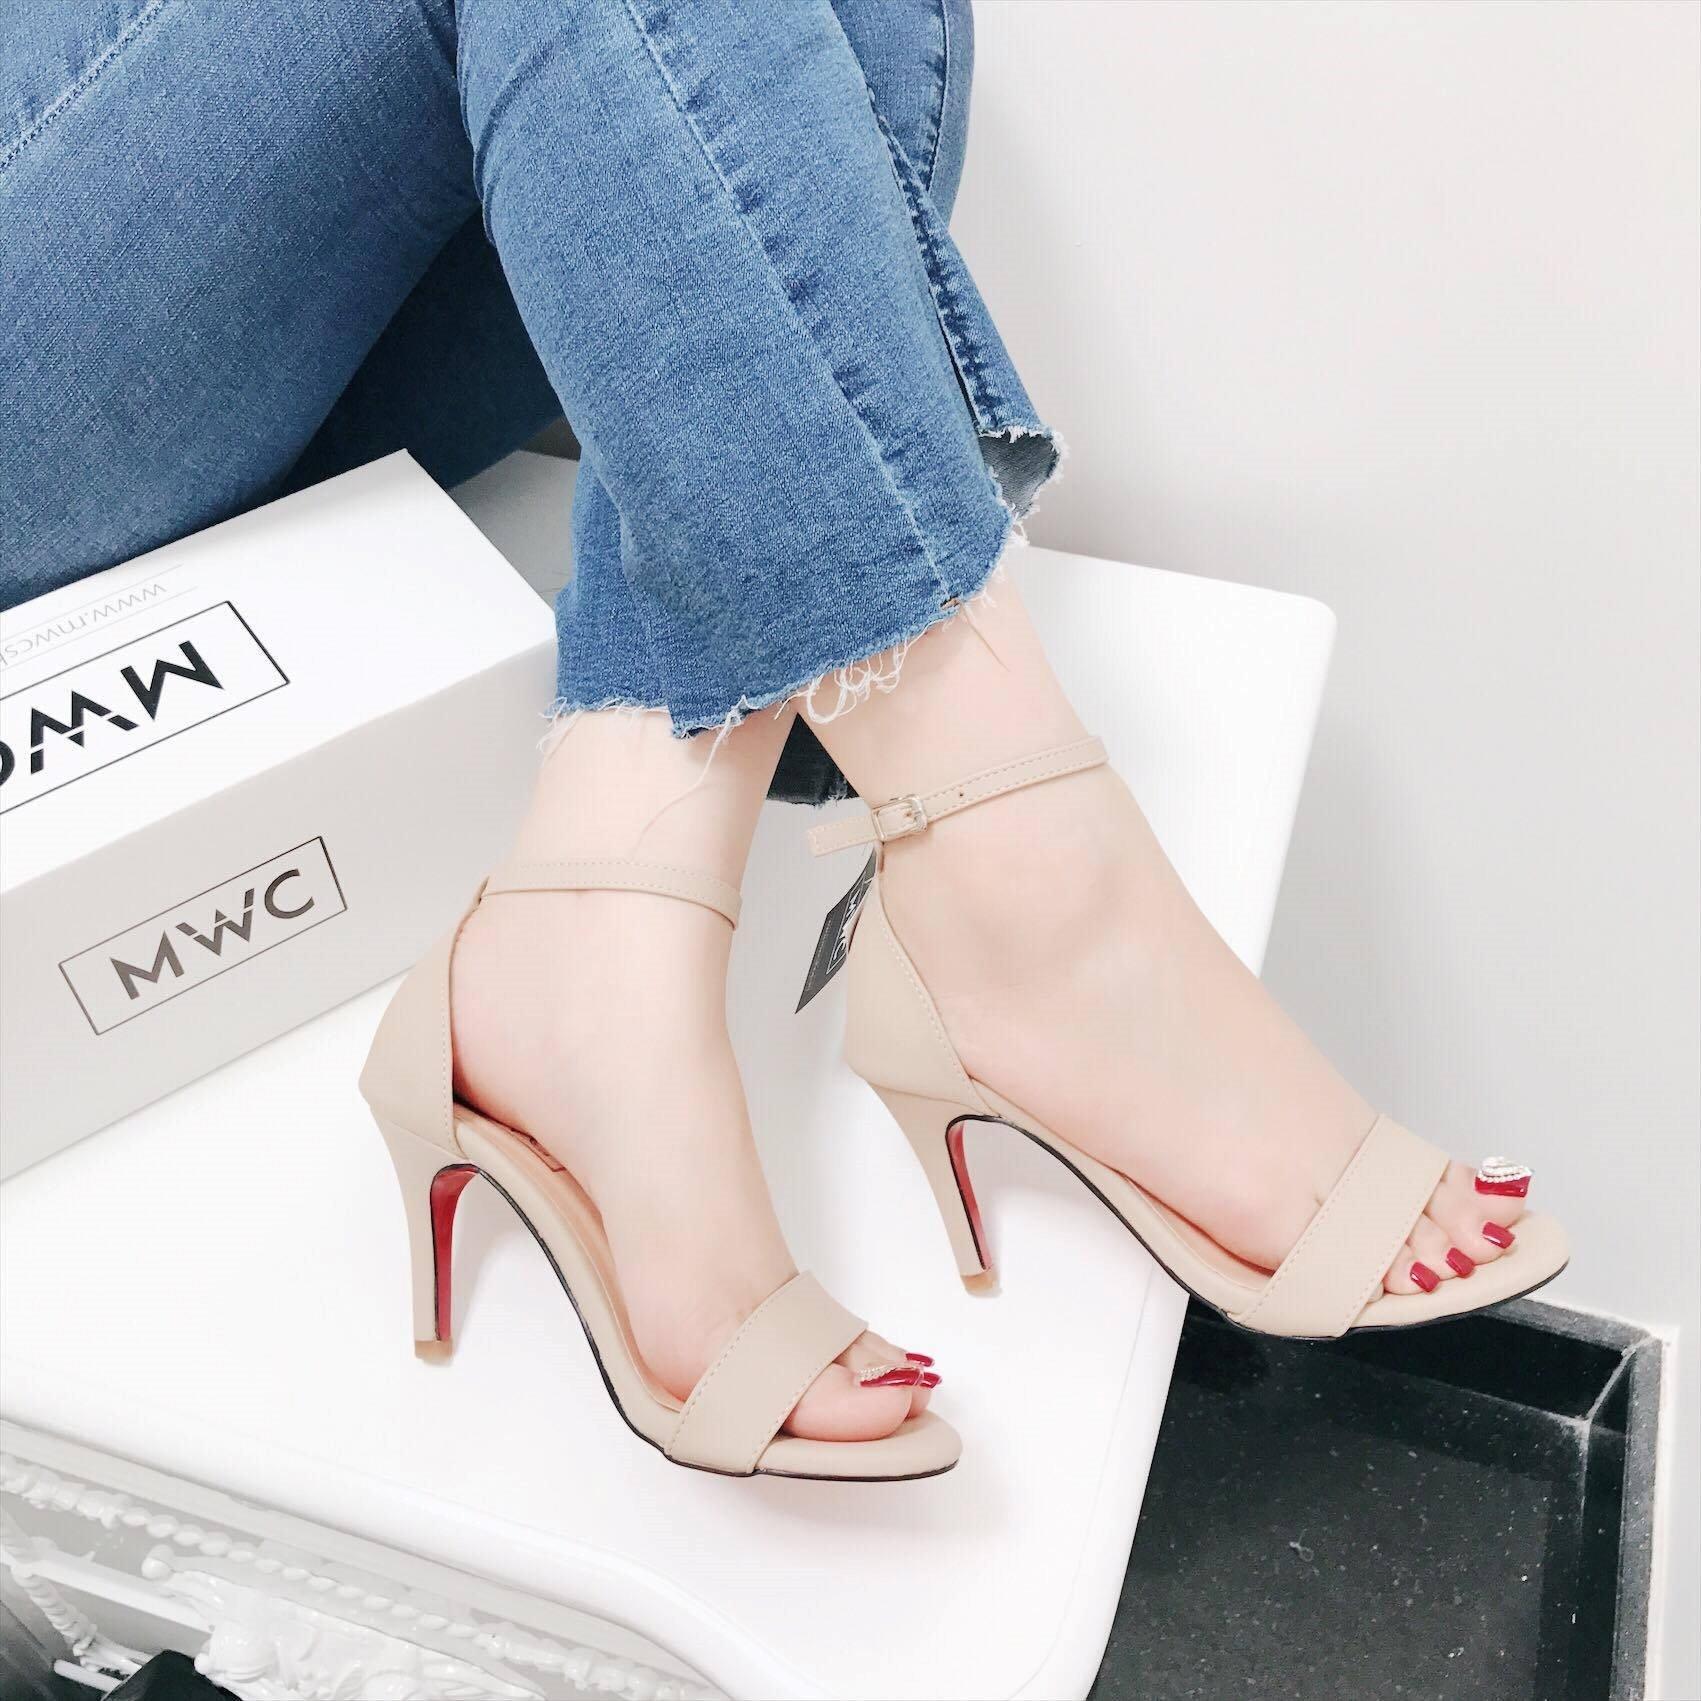 Giày cao gót MWC NUCG- 3552 - KEM